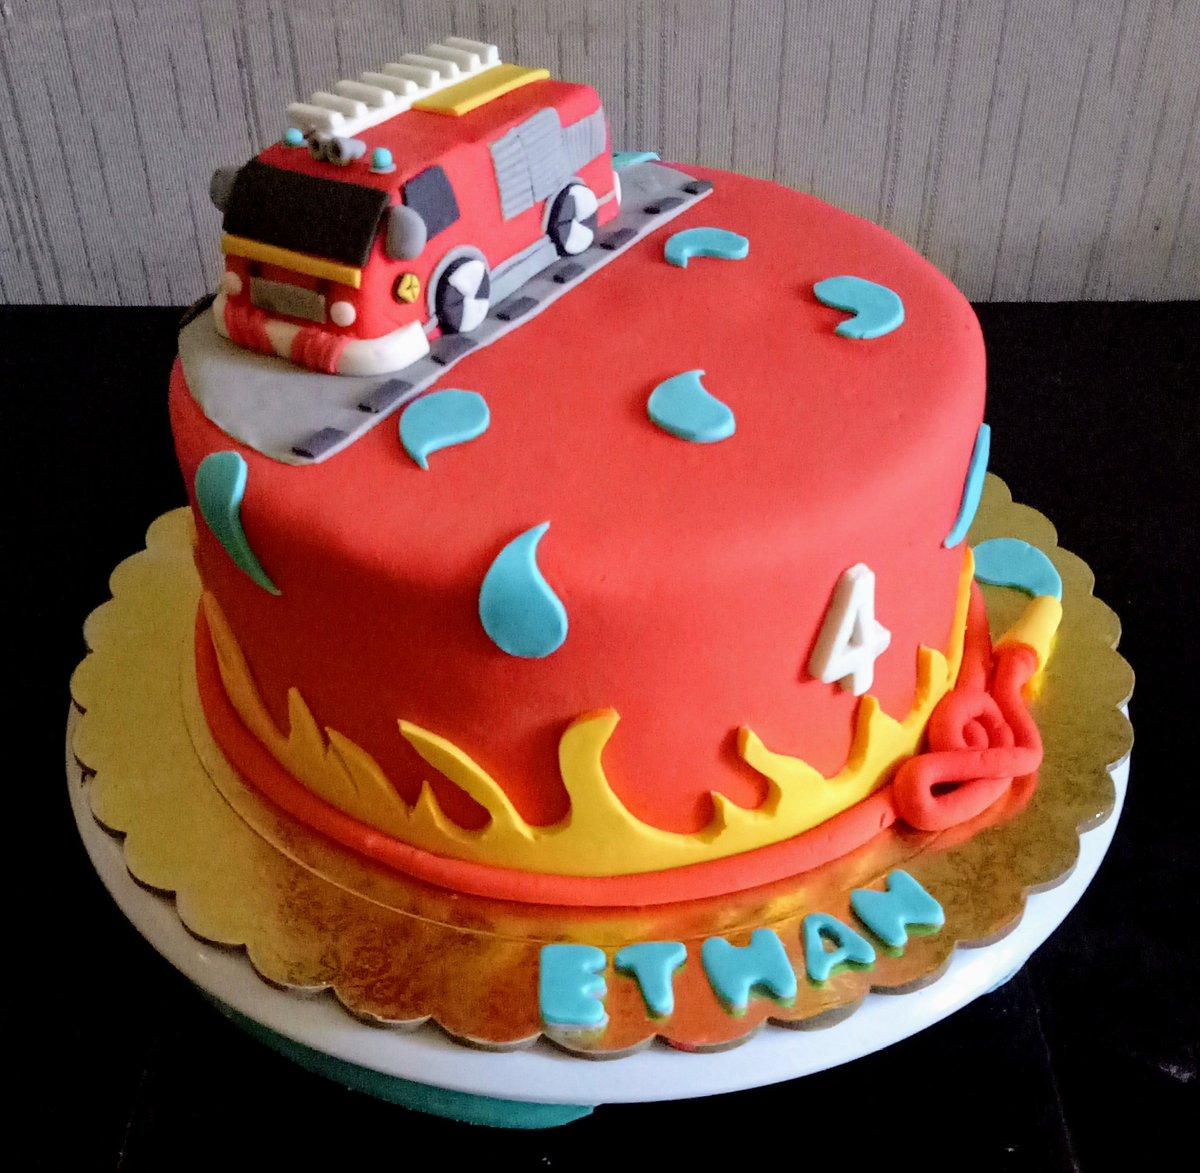 Tremendous Lynnton Bakers On Twitter Fire Truck Cake Firetruckcake Funny Birthday Cards Online Overcheapnameinfo